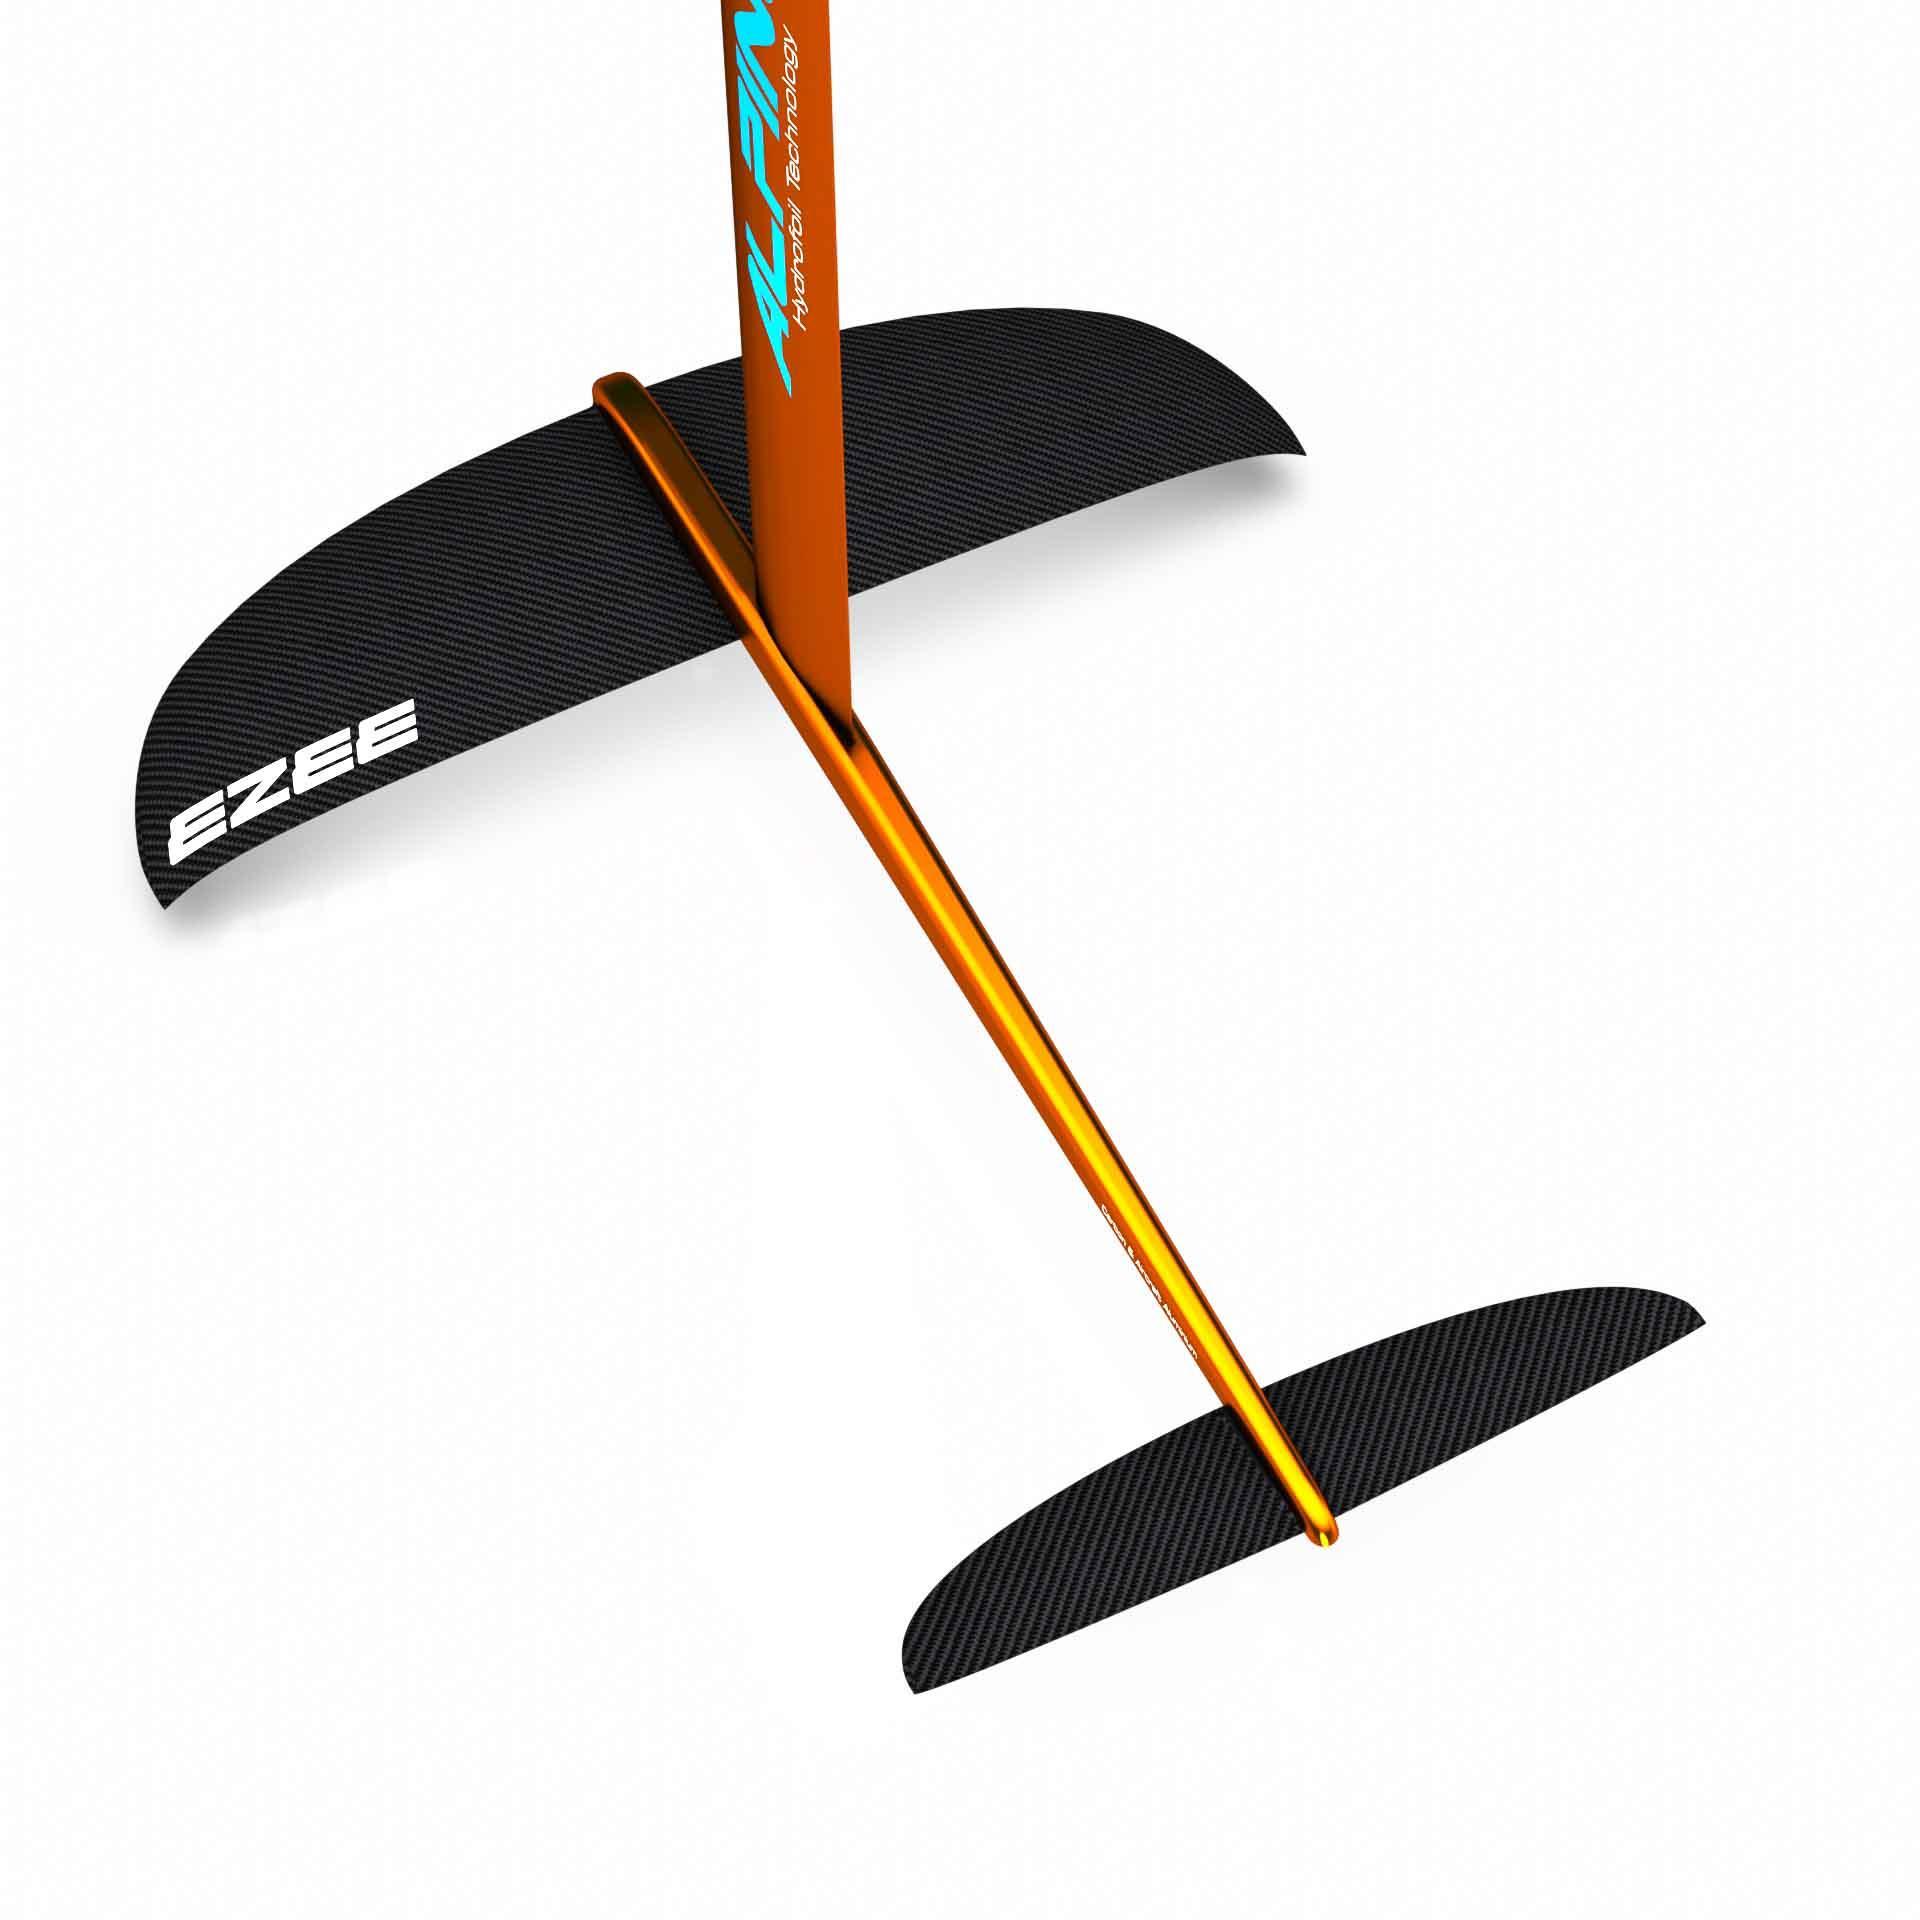 Kitefoil alpinefoil ezee 1000 11